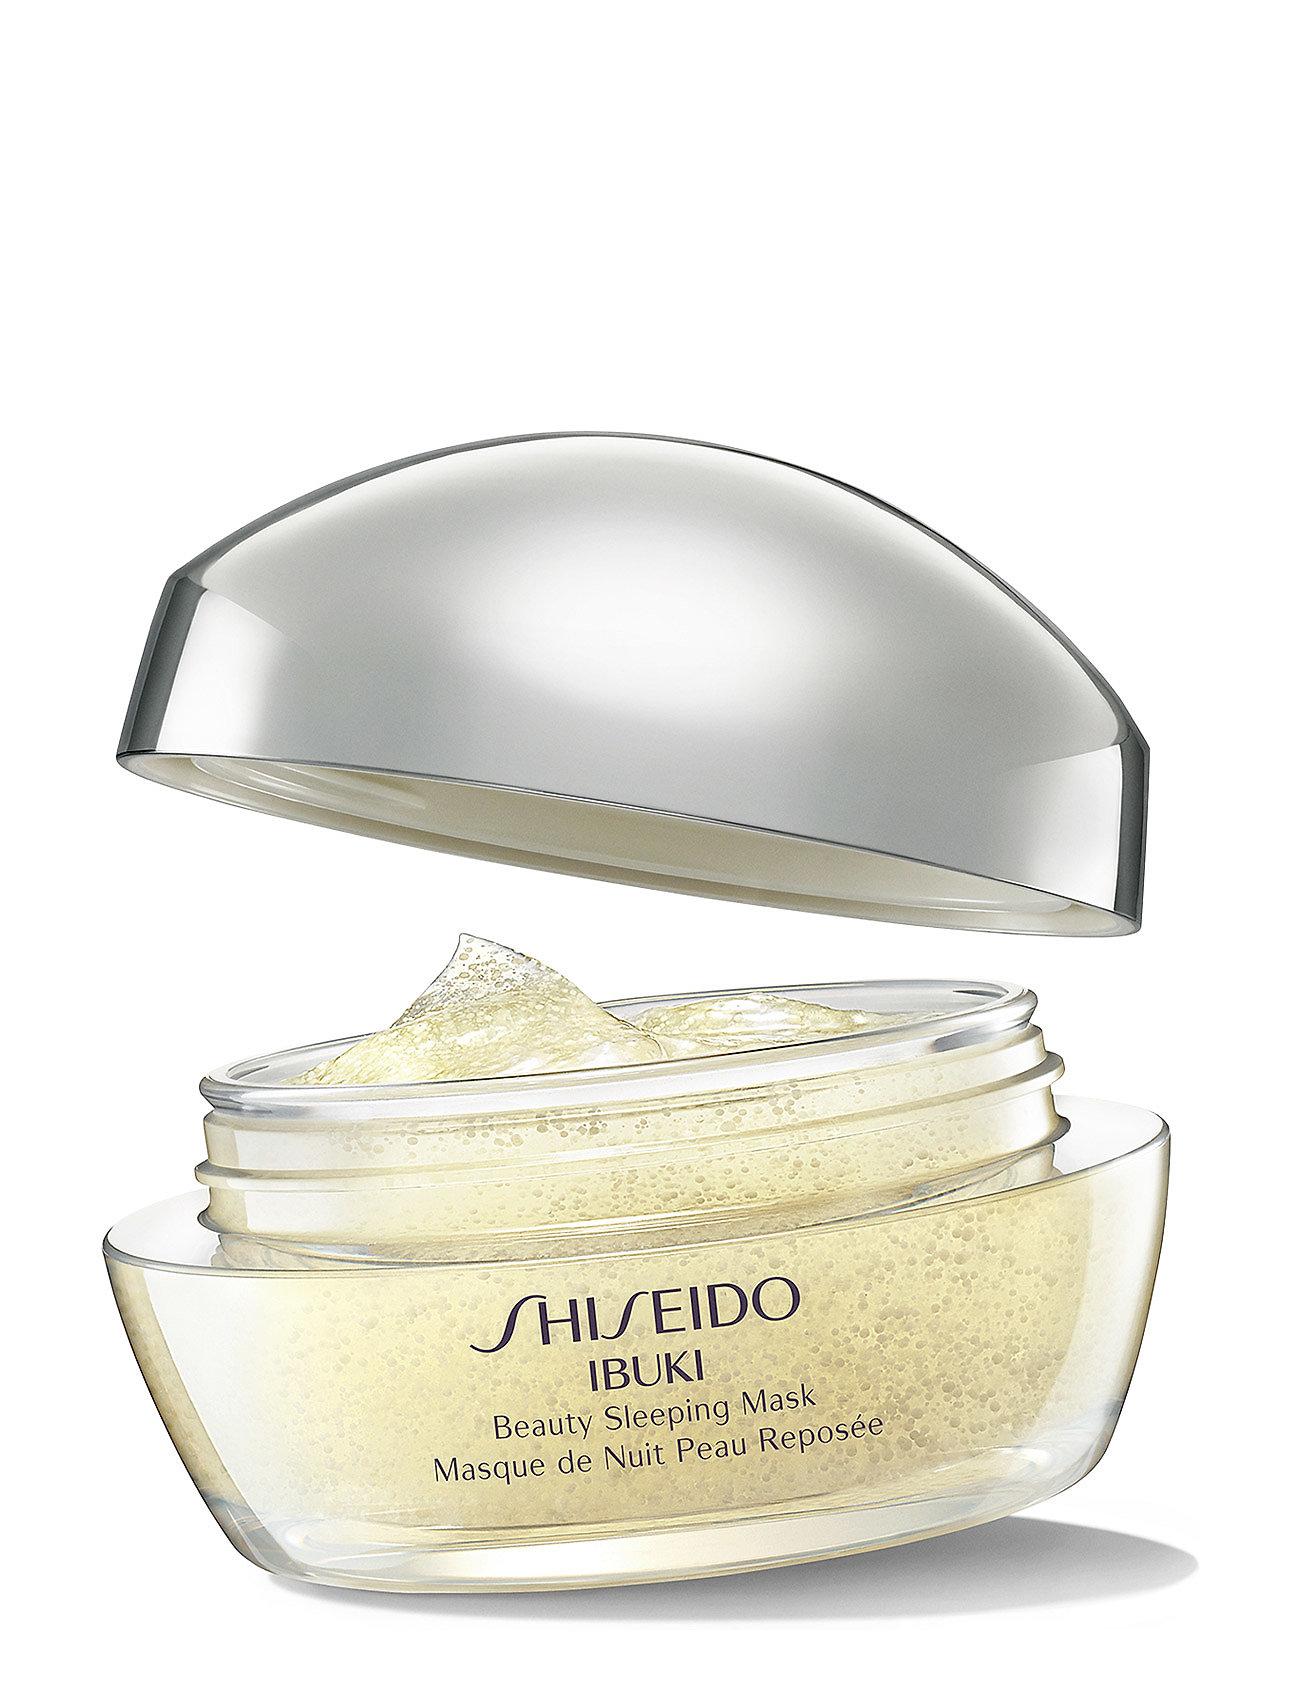 Shiseido ibuki beauty sleeping mask fra shiseido på boozt.com dk